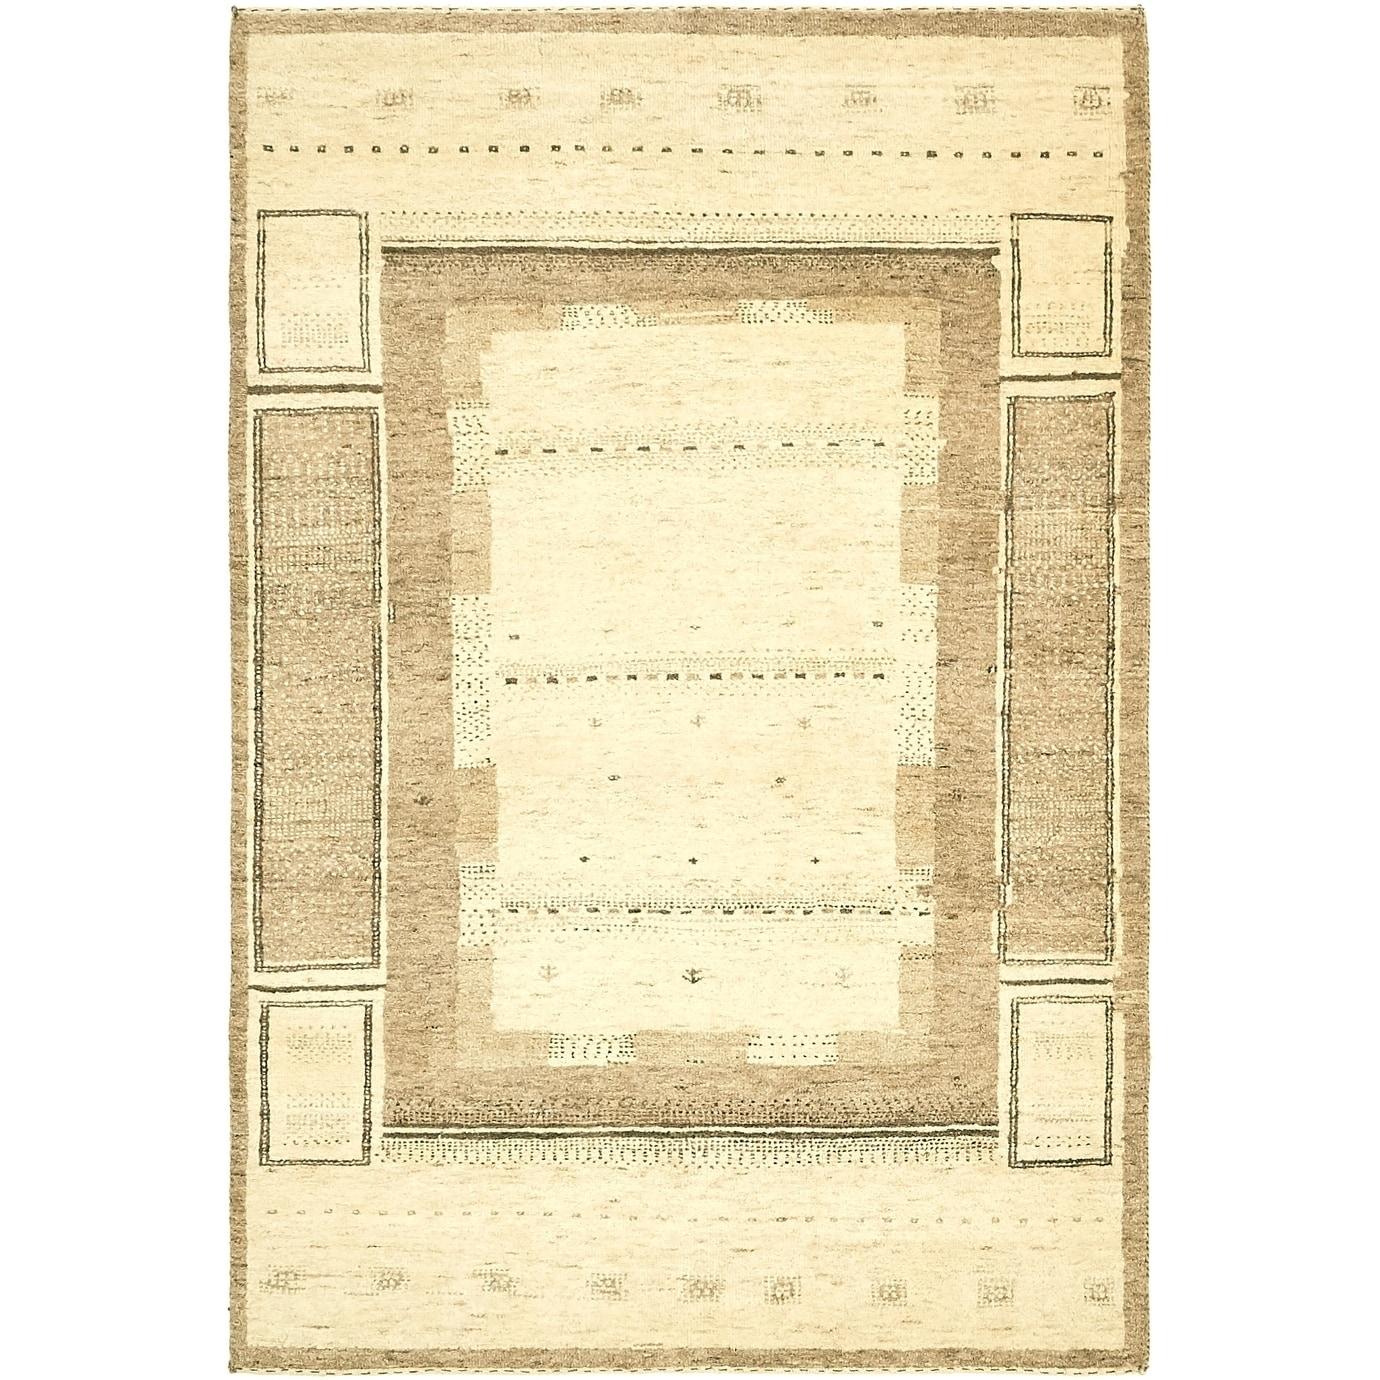 Hand Knotted Kashkuli Gabbeh Wool Area Rug - 3 10 x 5 9 (Cream - 3 10 x 5 9)